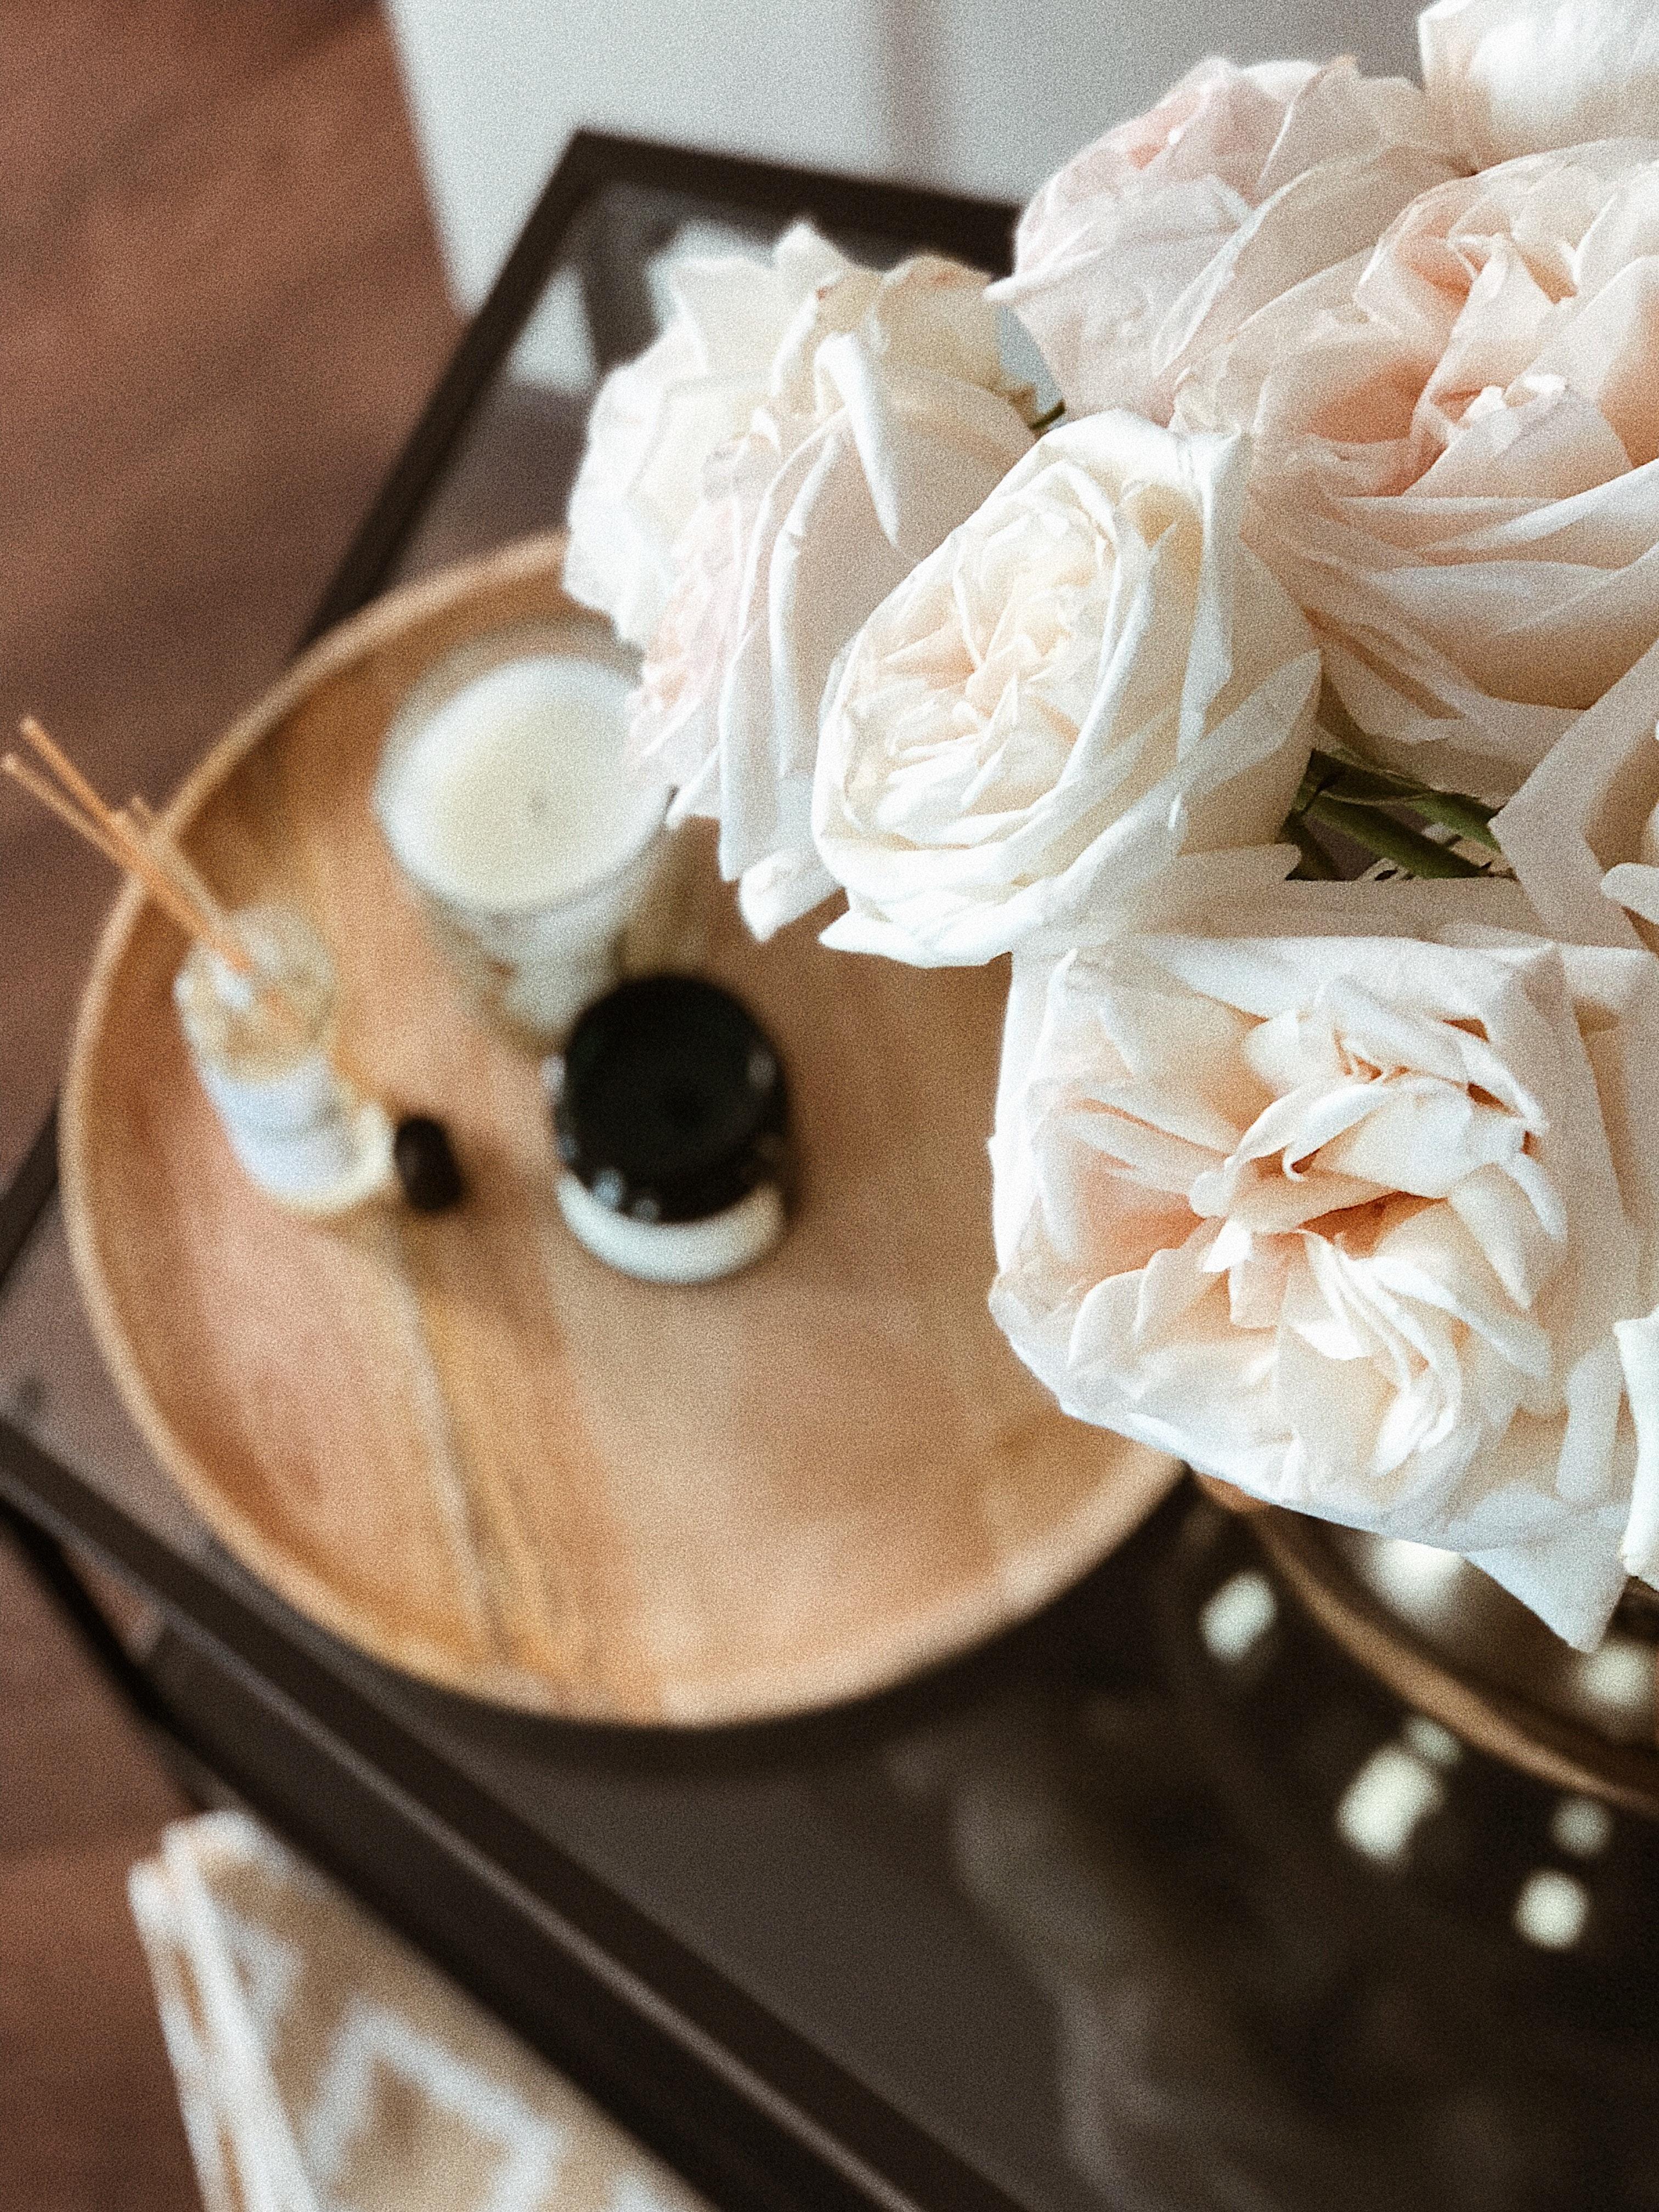 Pink Rose, Celebration, Roses, Wood, White flowers, HQ Photo